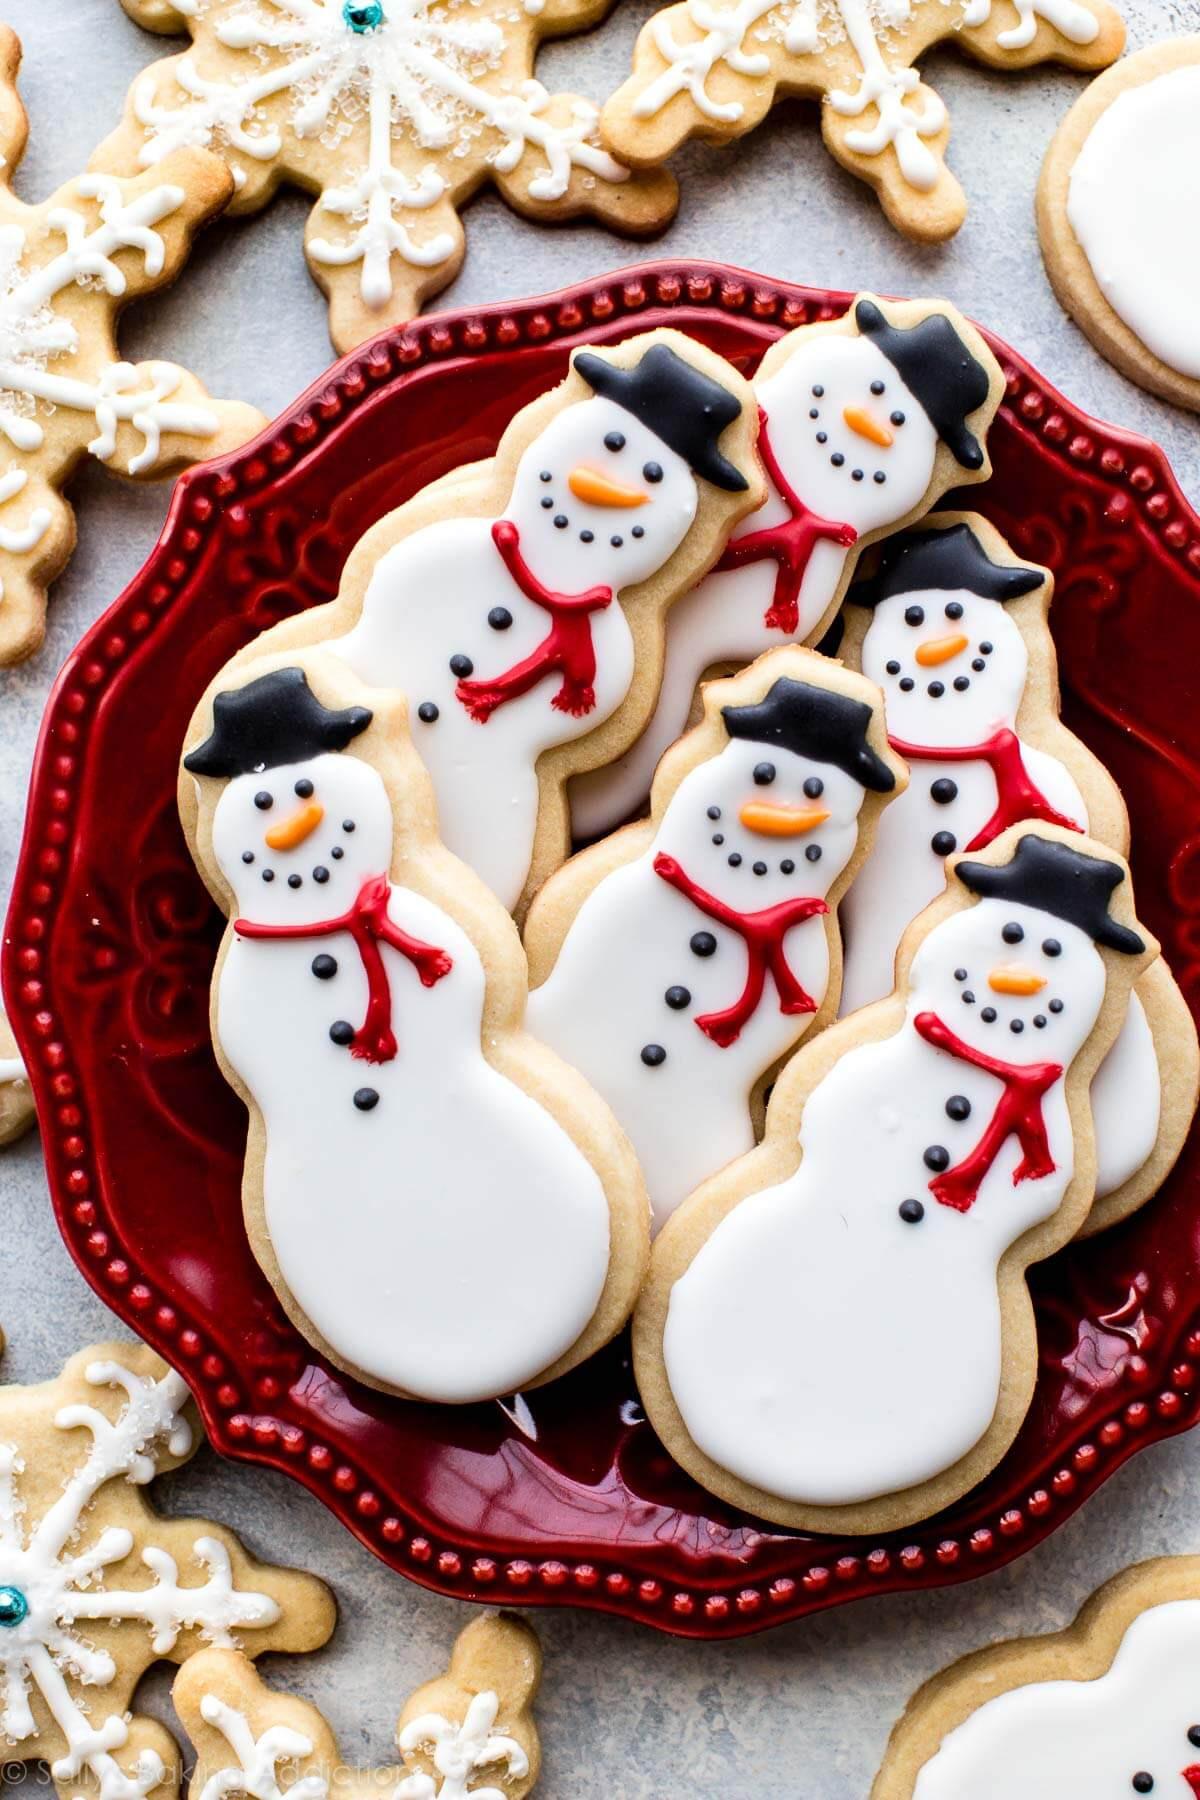 Recipes For Christmas Sugar Cookies  Snowman Sugar Cookies